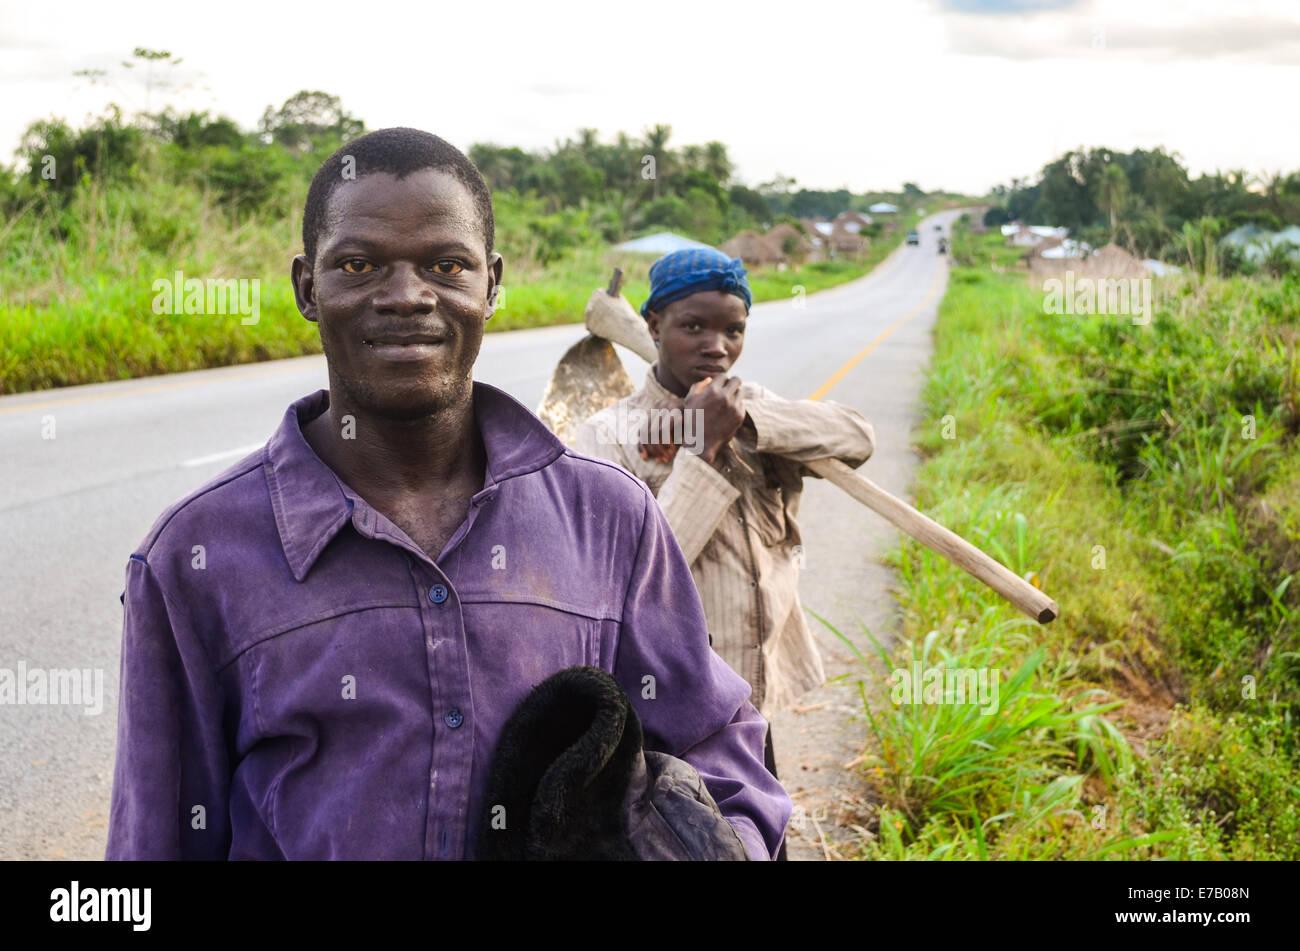 Two men after work in Sierra Leone Stock Photo